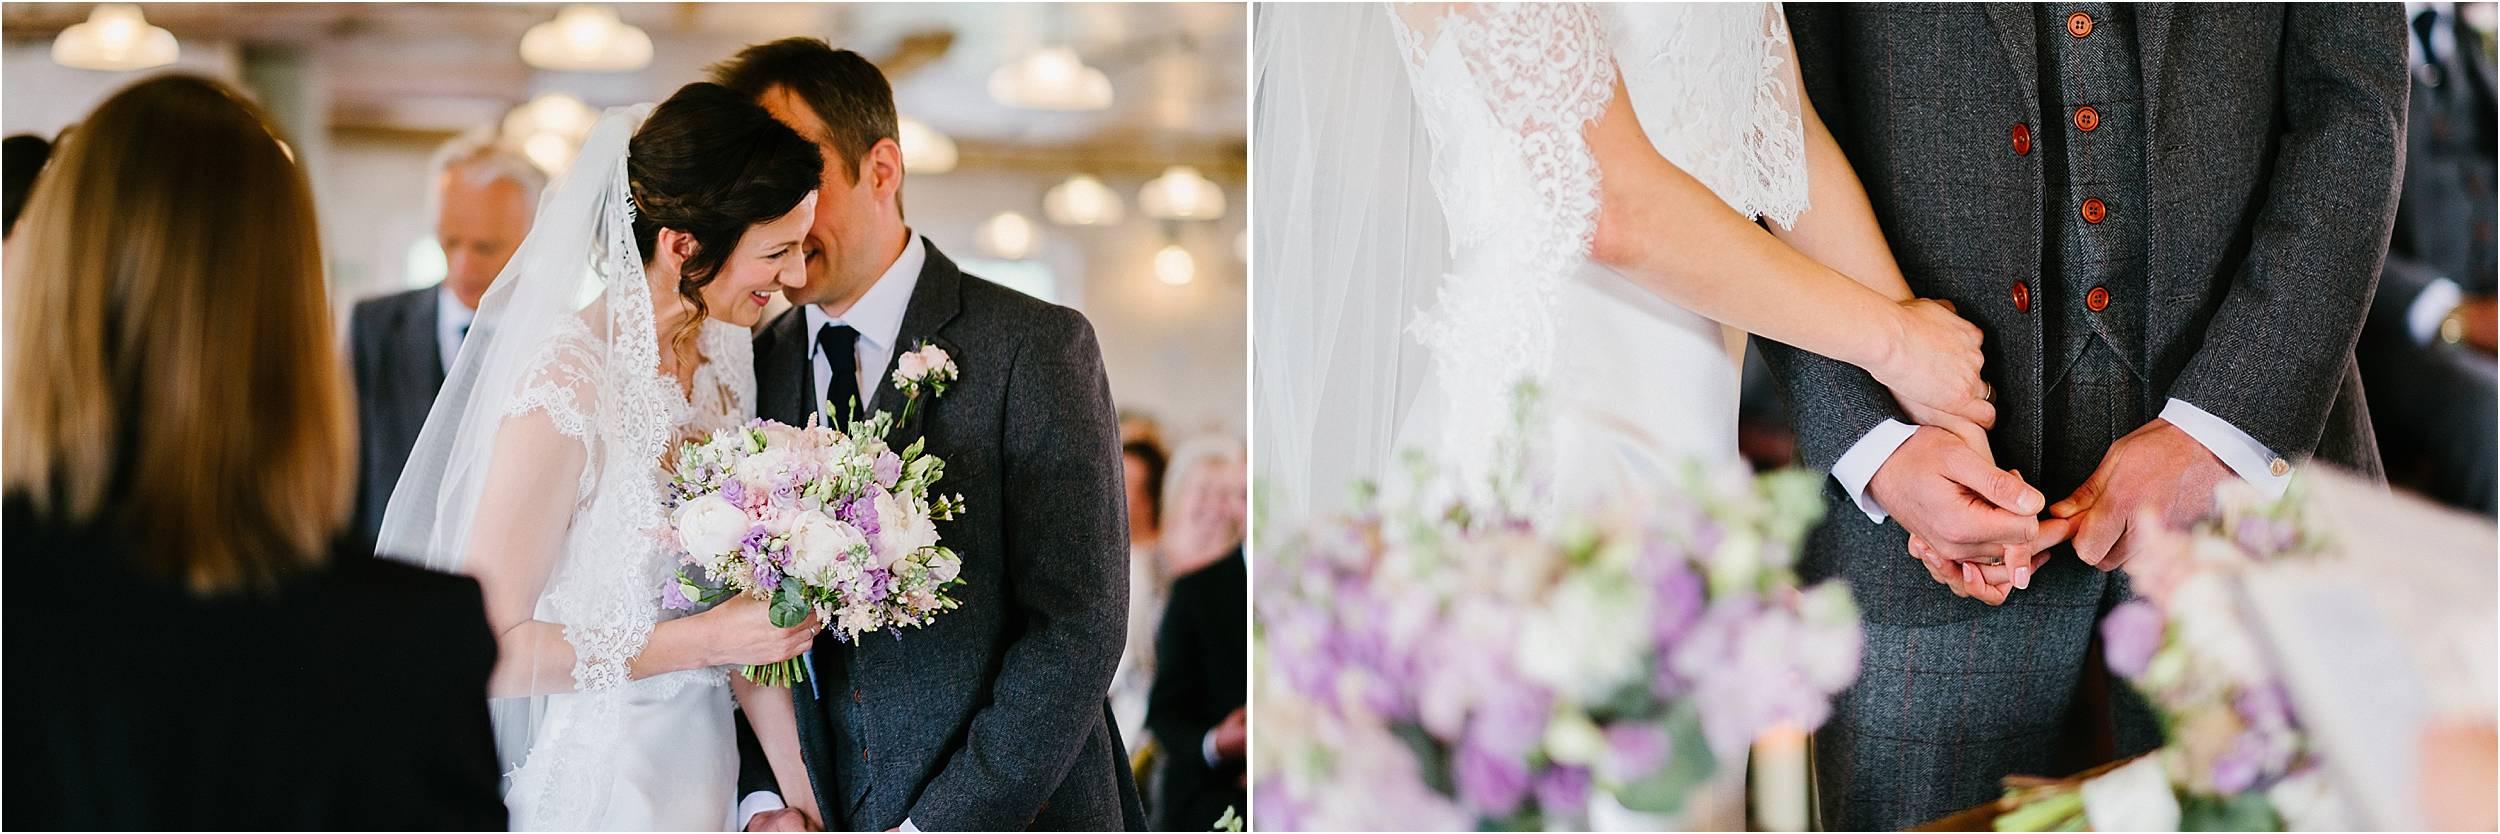 West Mill Derby Wedding Photographer_0067.jpg